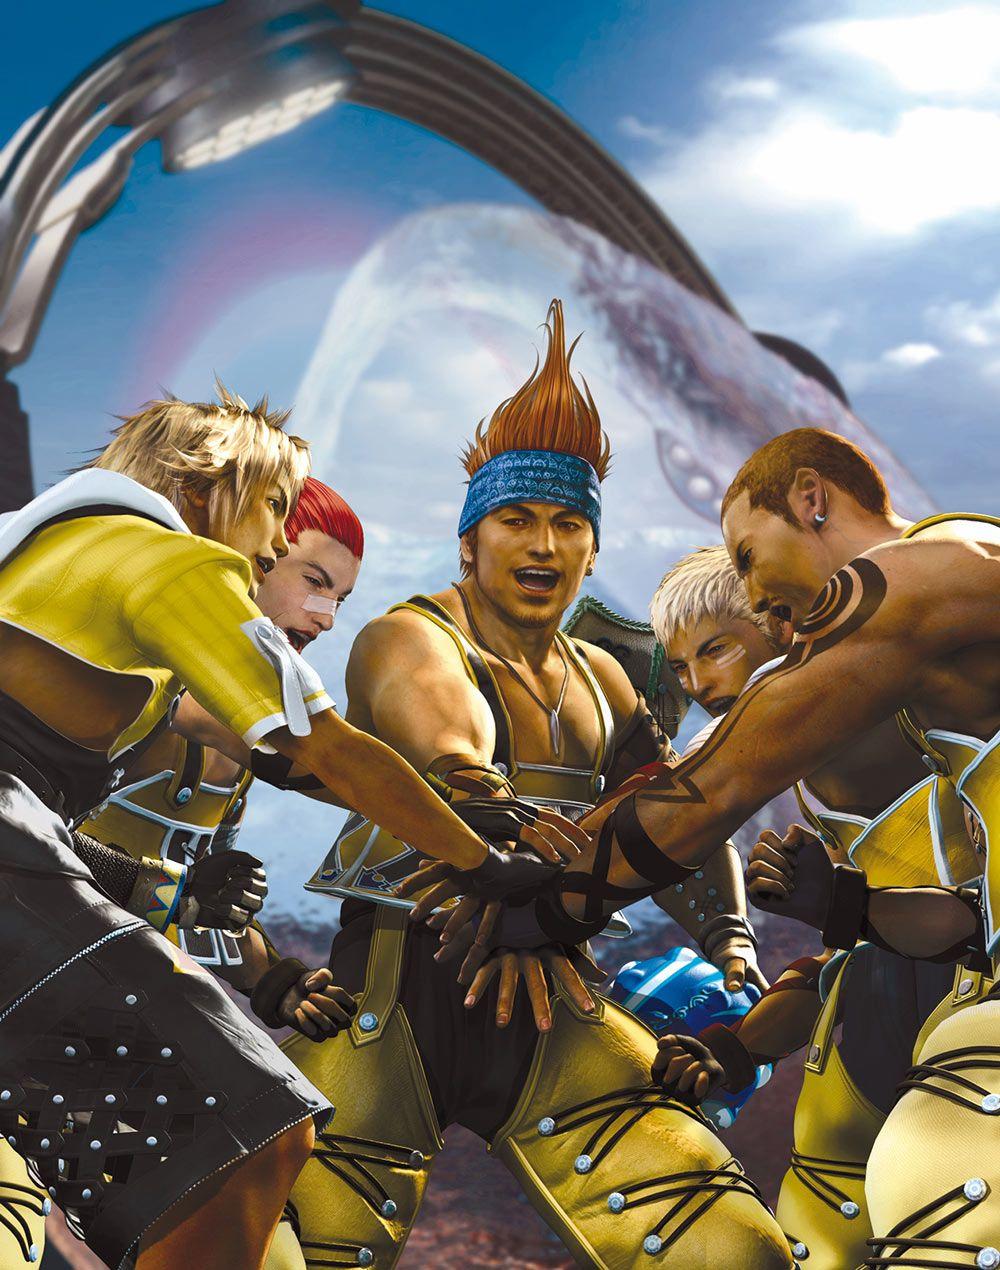 Cg Artwork Wakka Aurochs Characters Art Final Fantasy X Final Fantasy X Final Fantasy Anime Final Fantasy Collection